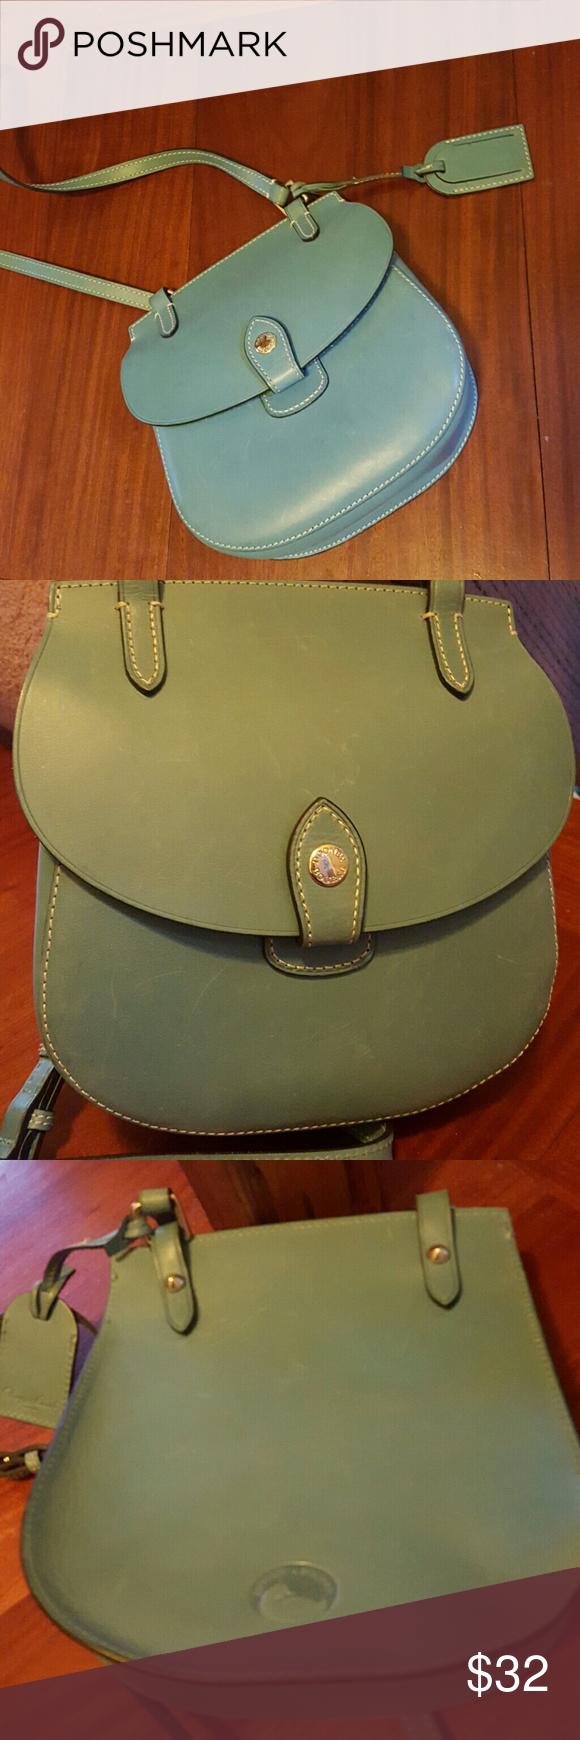 Dooney and Bourke Purse Light Blue dooney and bourke purse Dooney & Bourke Bags Crossbody Bags